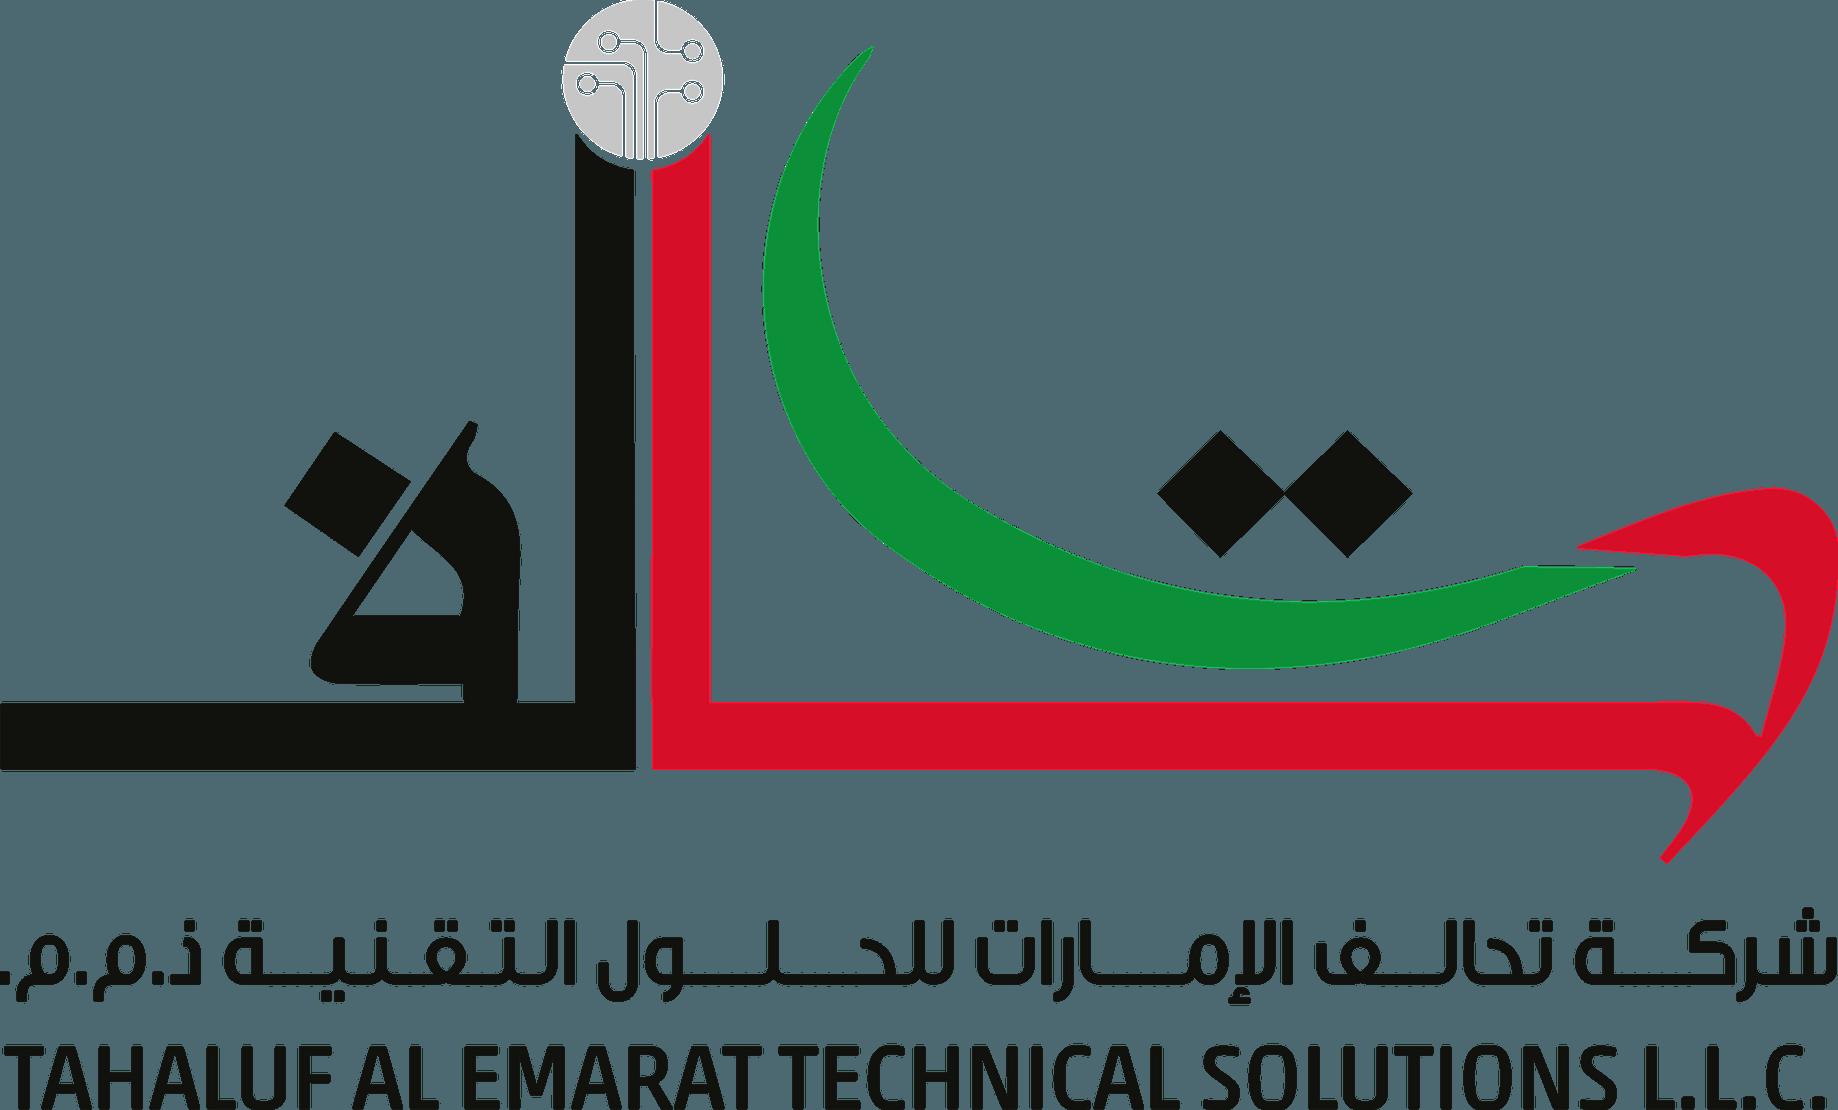 Tahaluf Alemarat Technical Solutions L.L.C